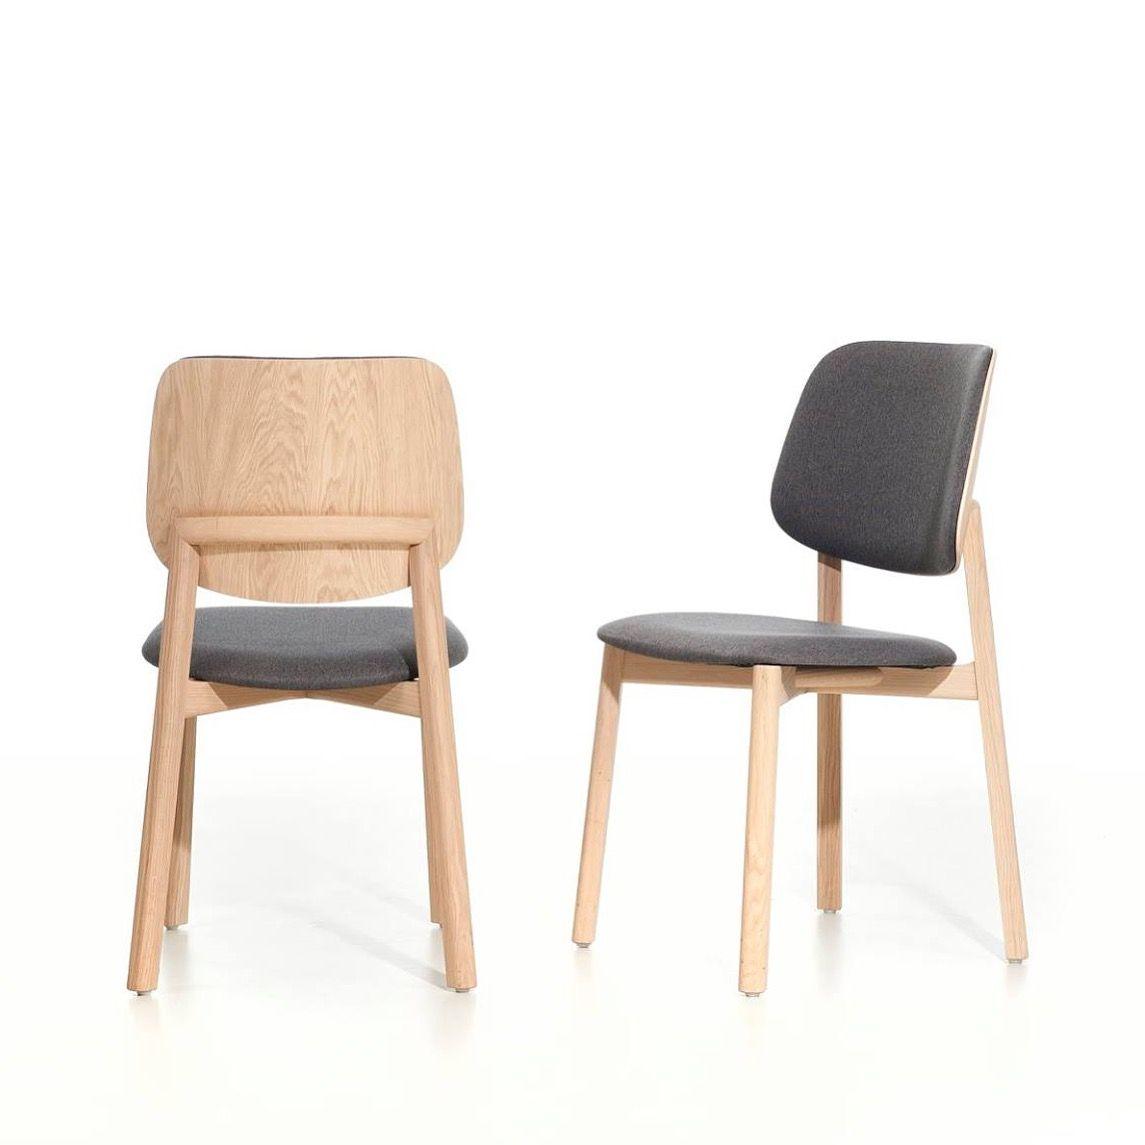 Lorem chair for paged furniture design by studio szpunar for Moderne stoelen outlet